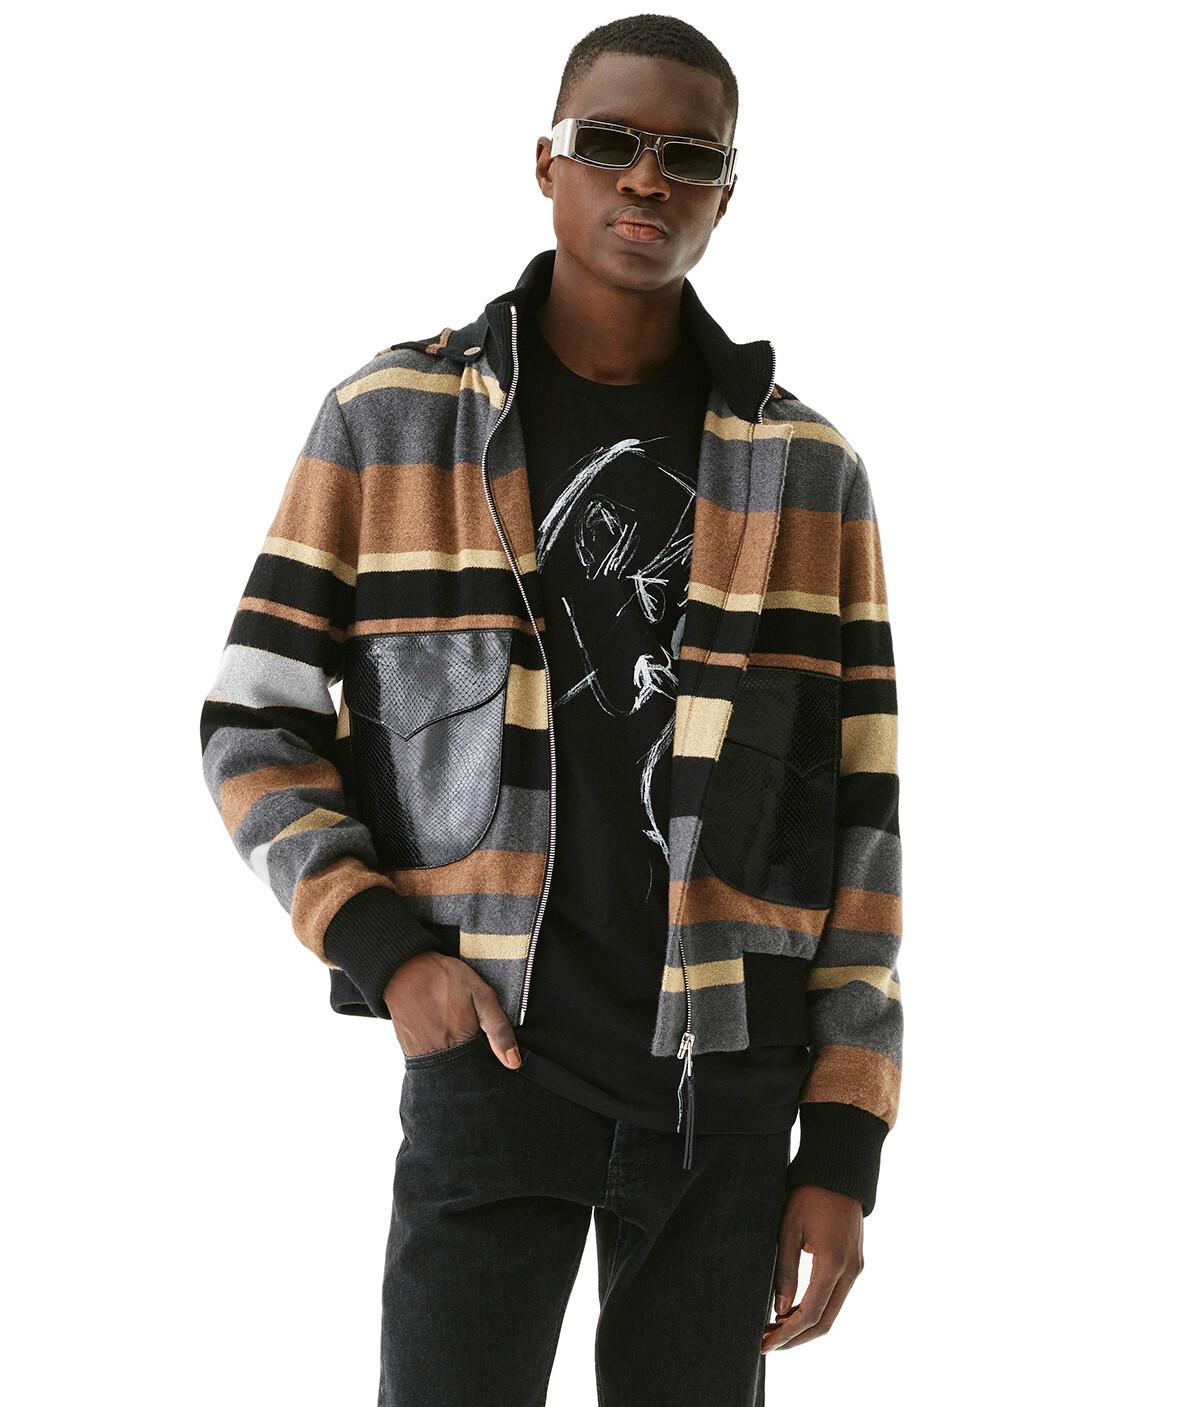 LOEWE Stripe Blouson Black/Beige/Grey front